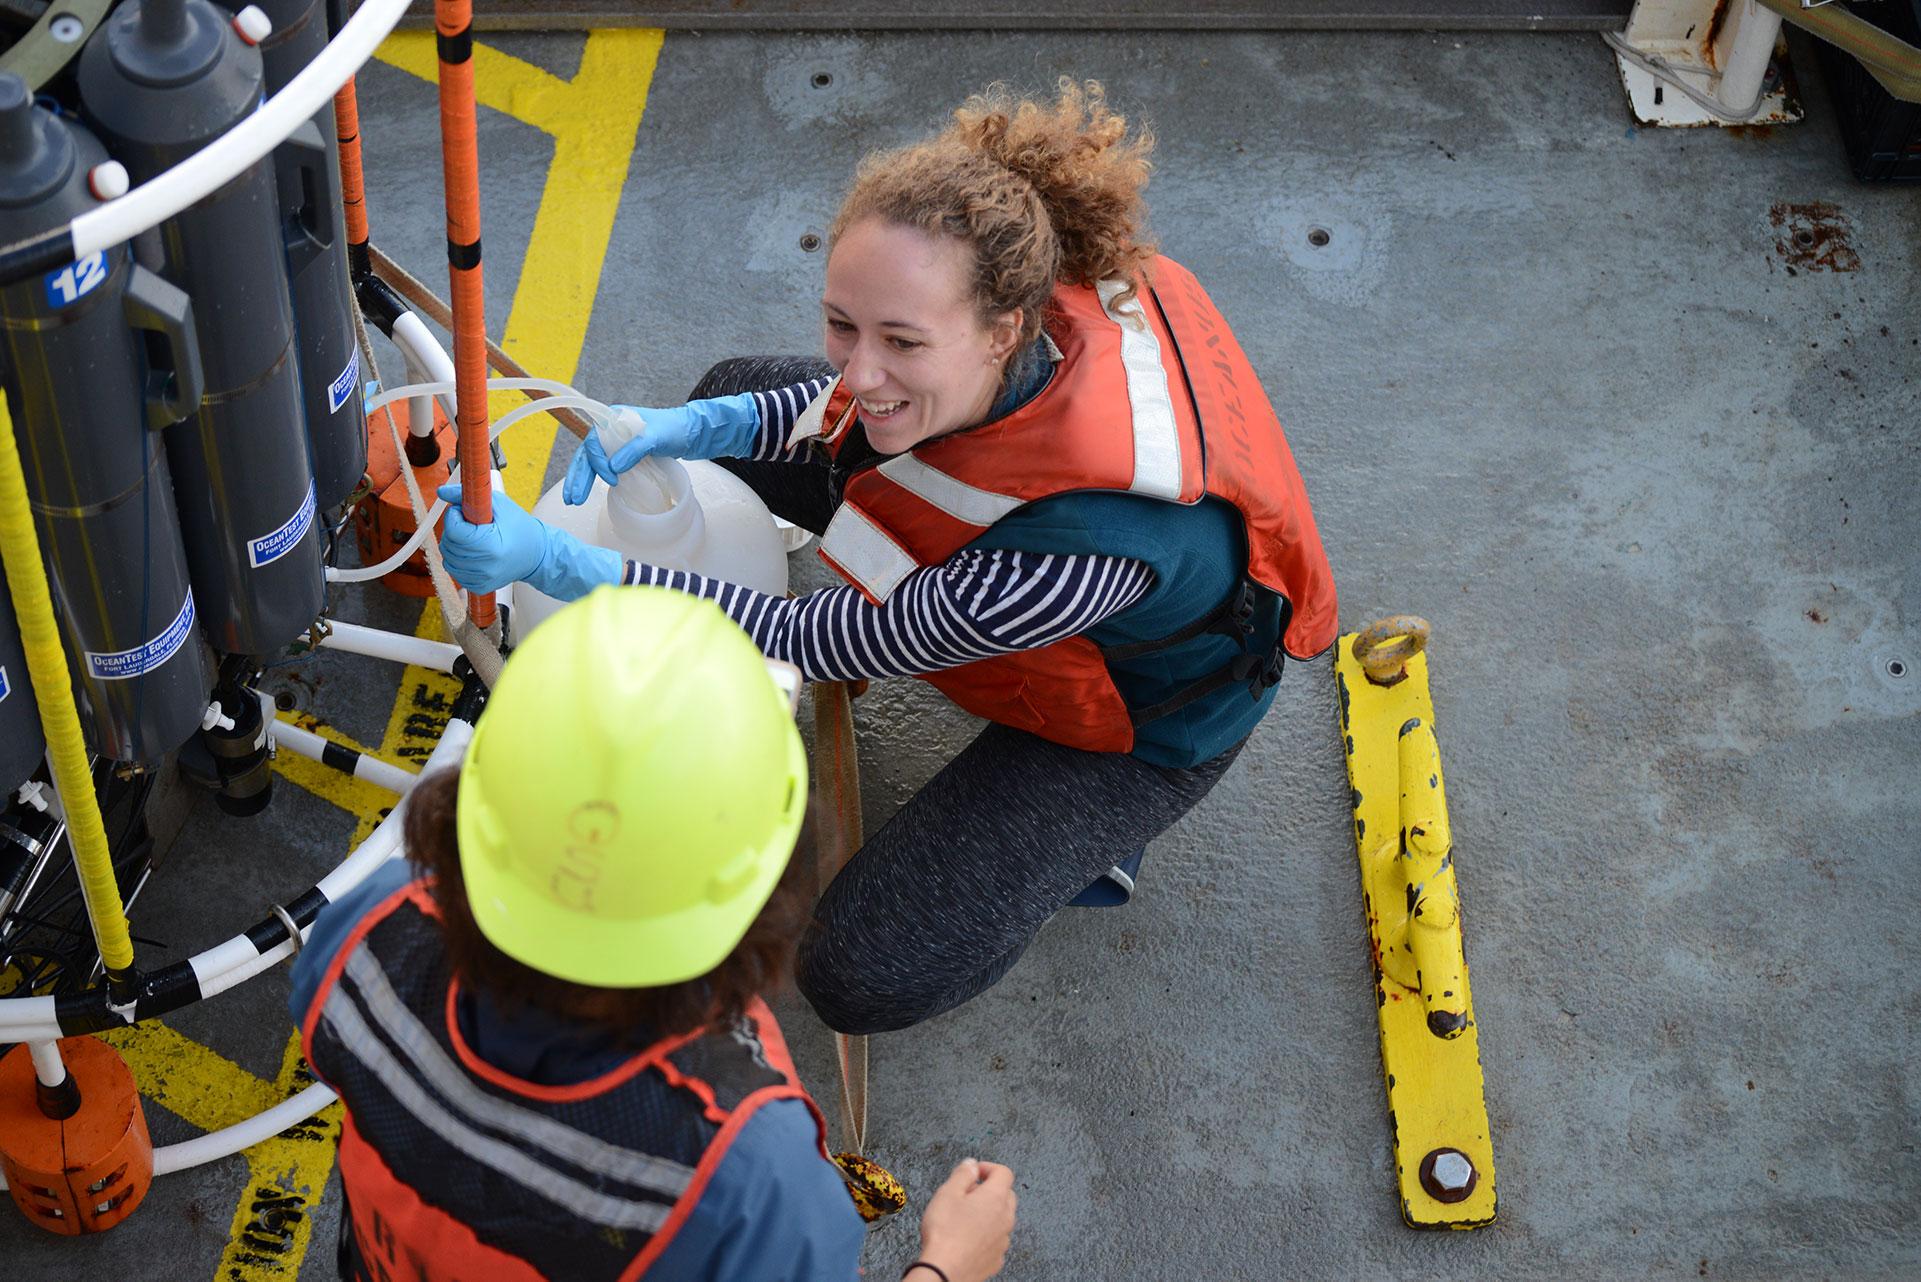 One of Levine's students checks the CTD. | Naomi Levine